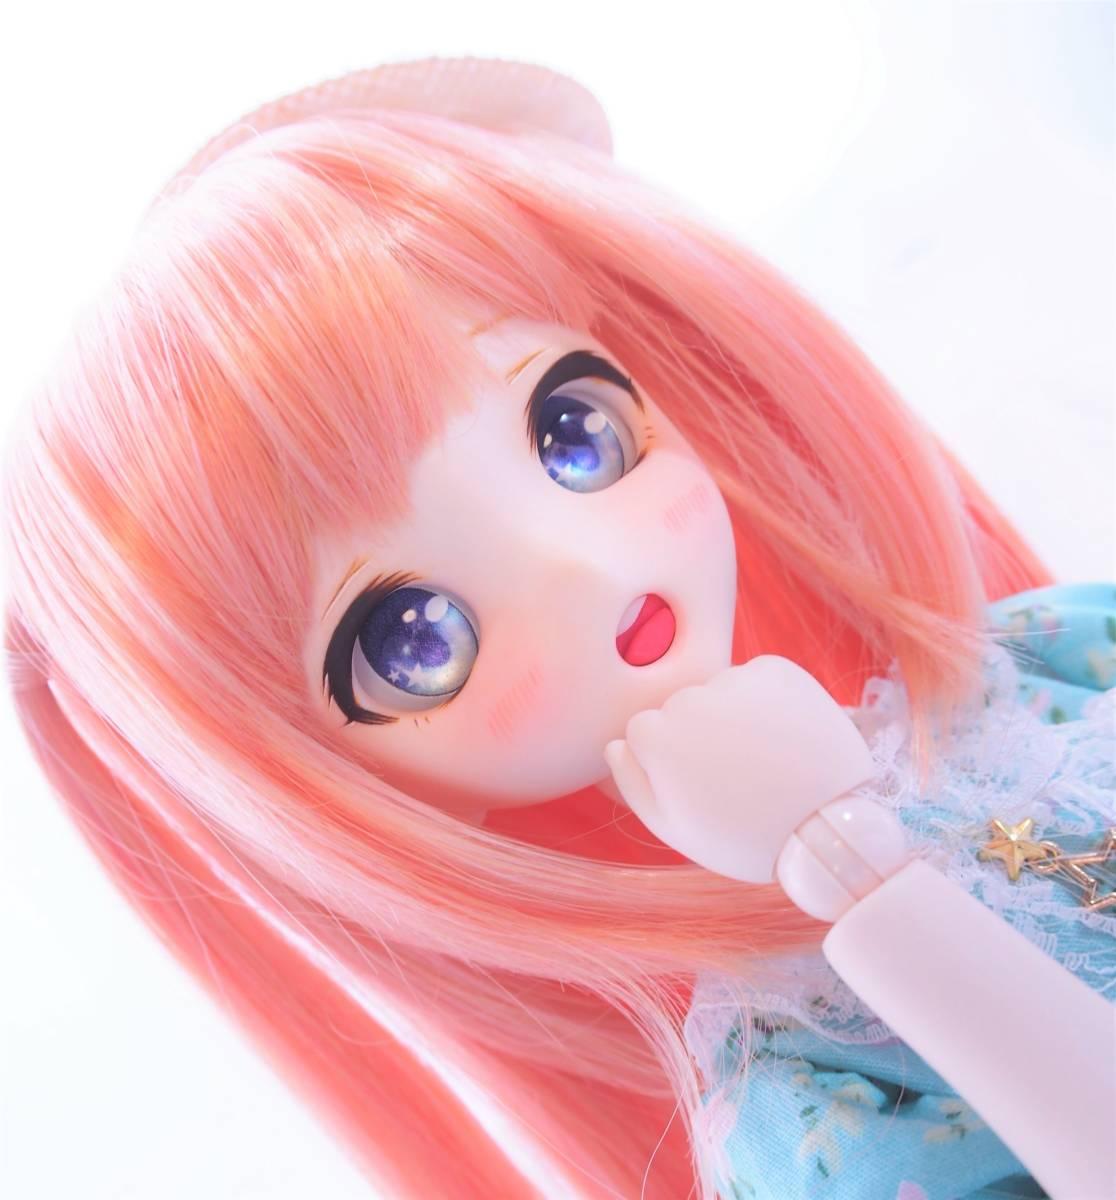 【Miel☆Magical】DDH-10 セミホワイト肌 カスタムヘッド+アイ